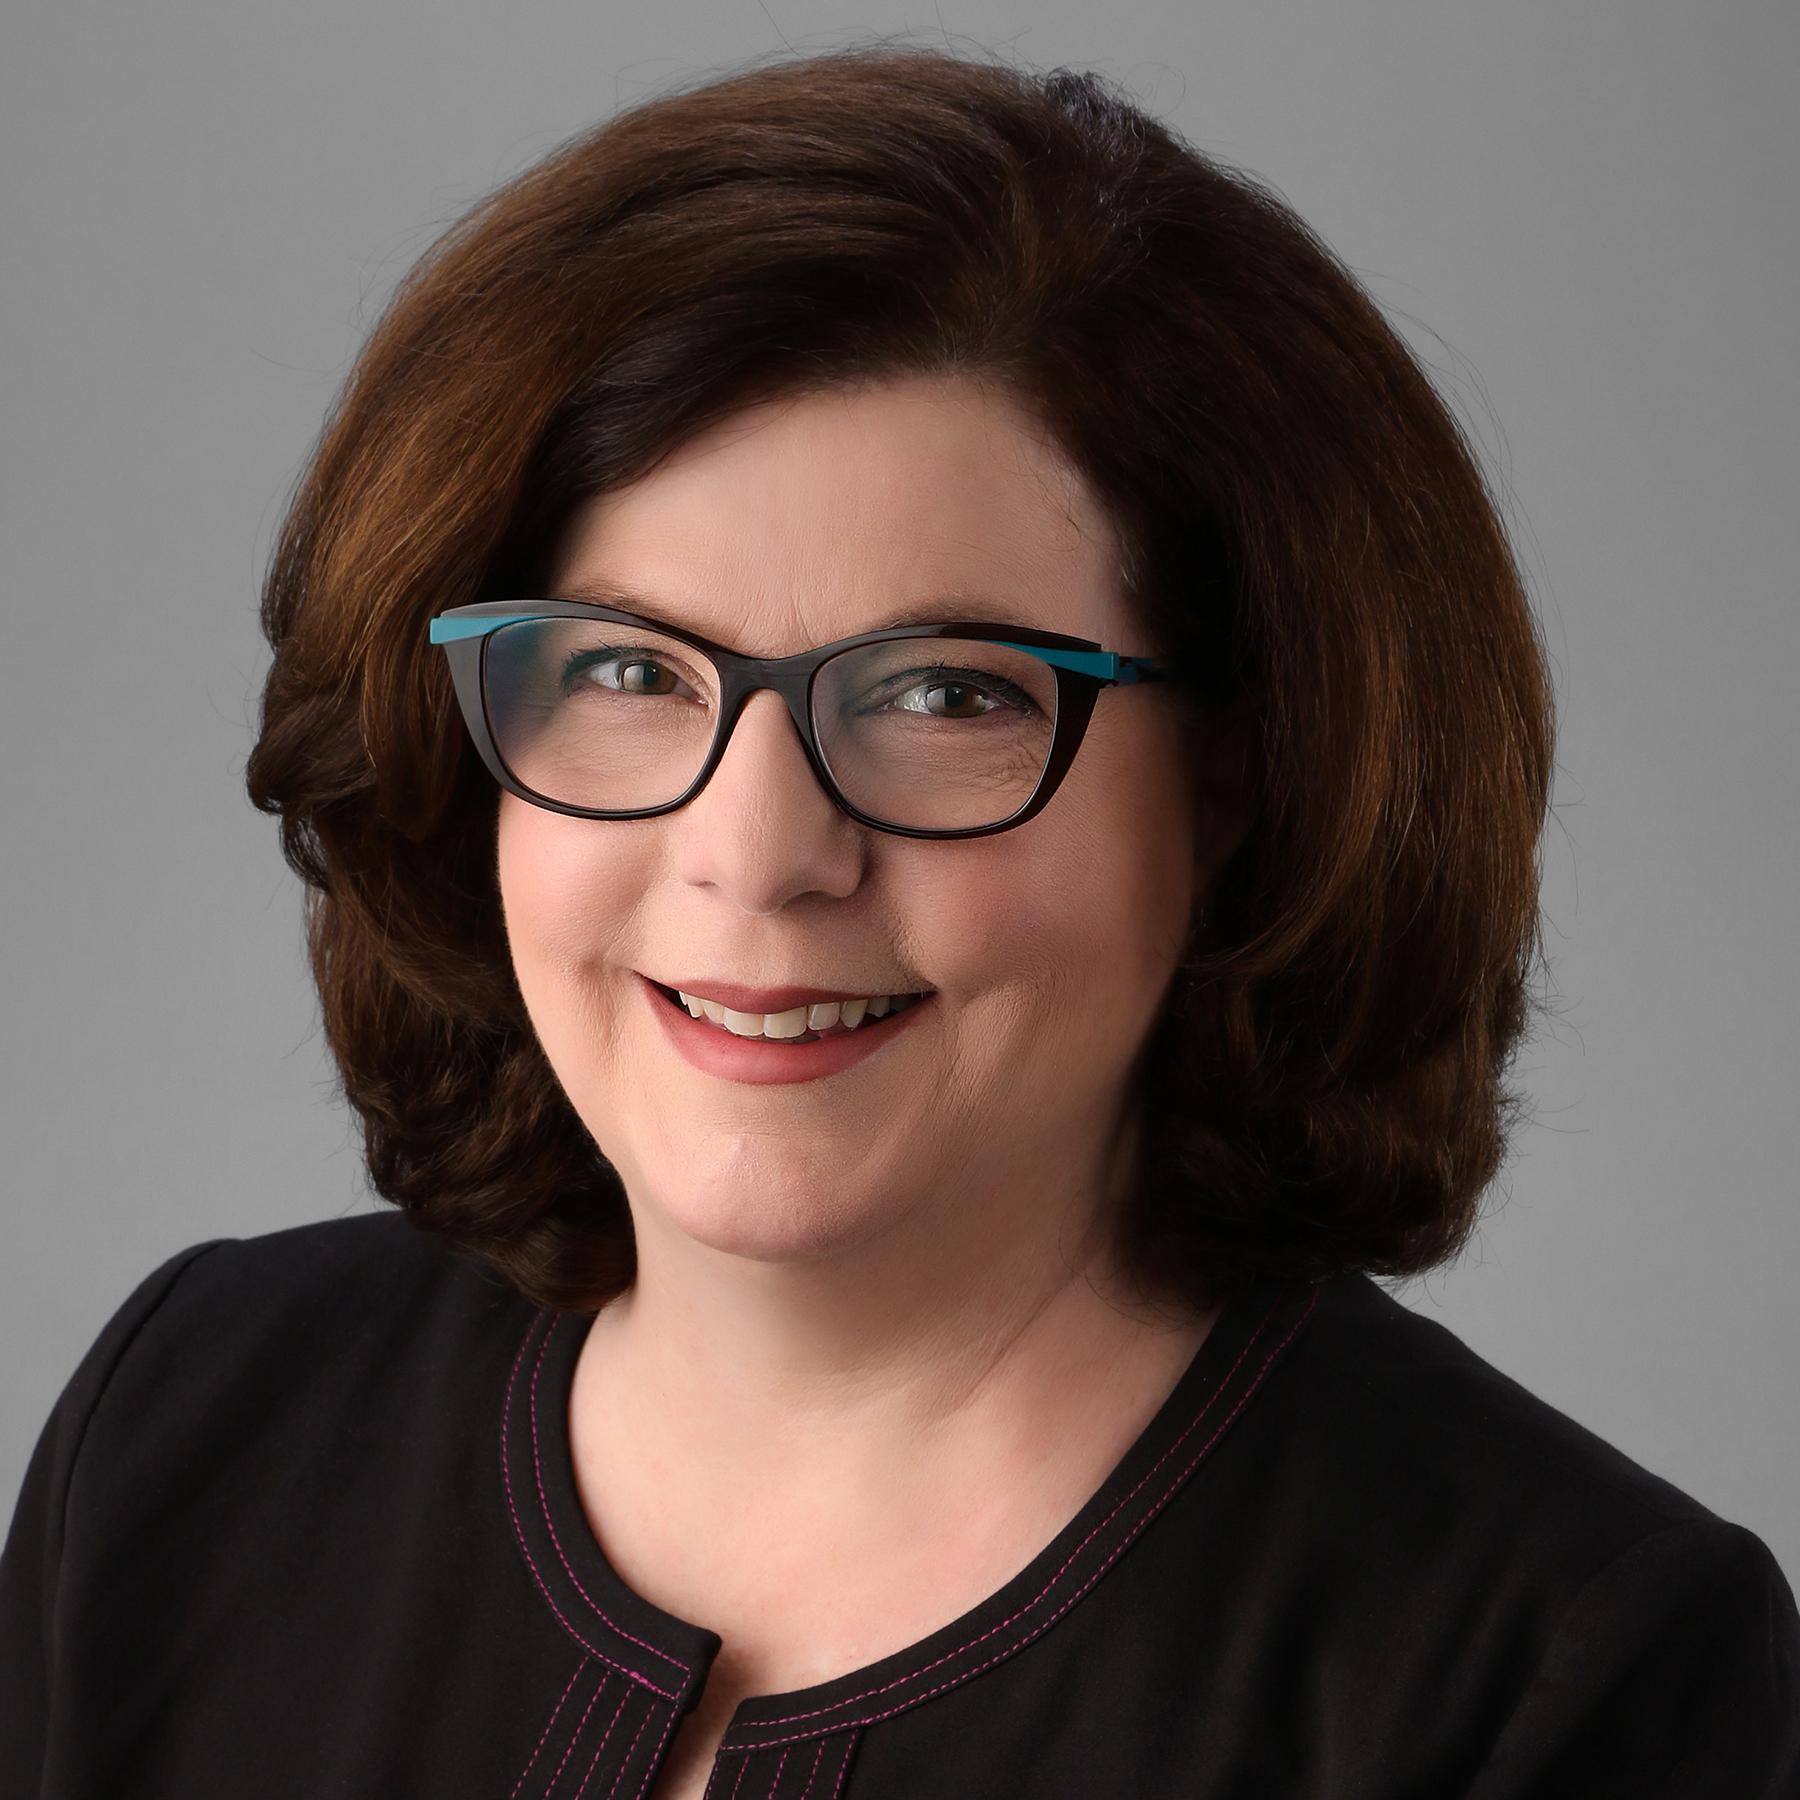 Portrait of Paula McDonnell